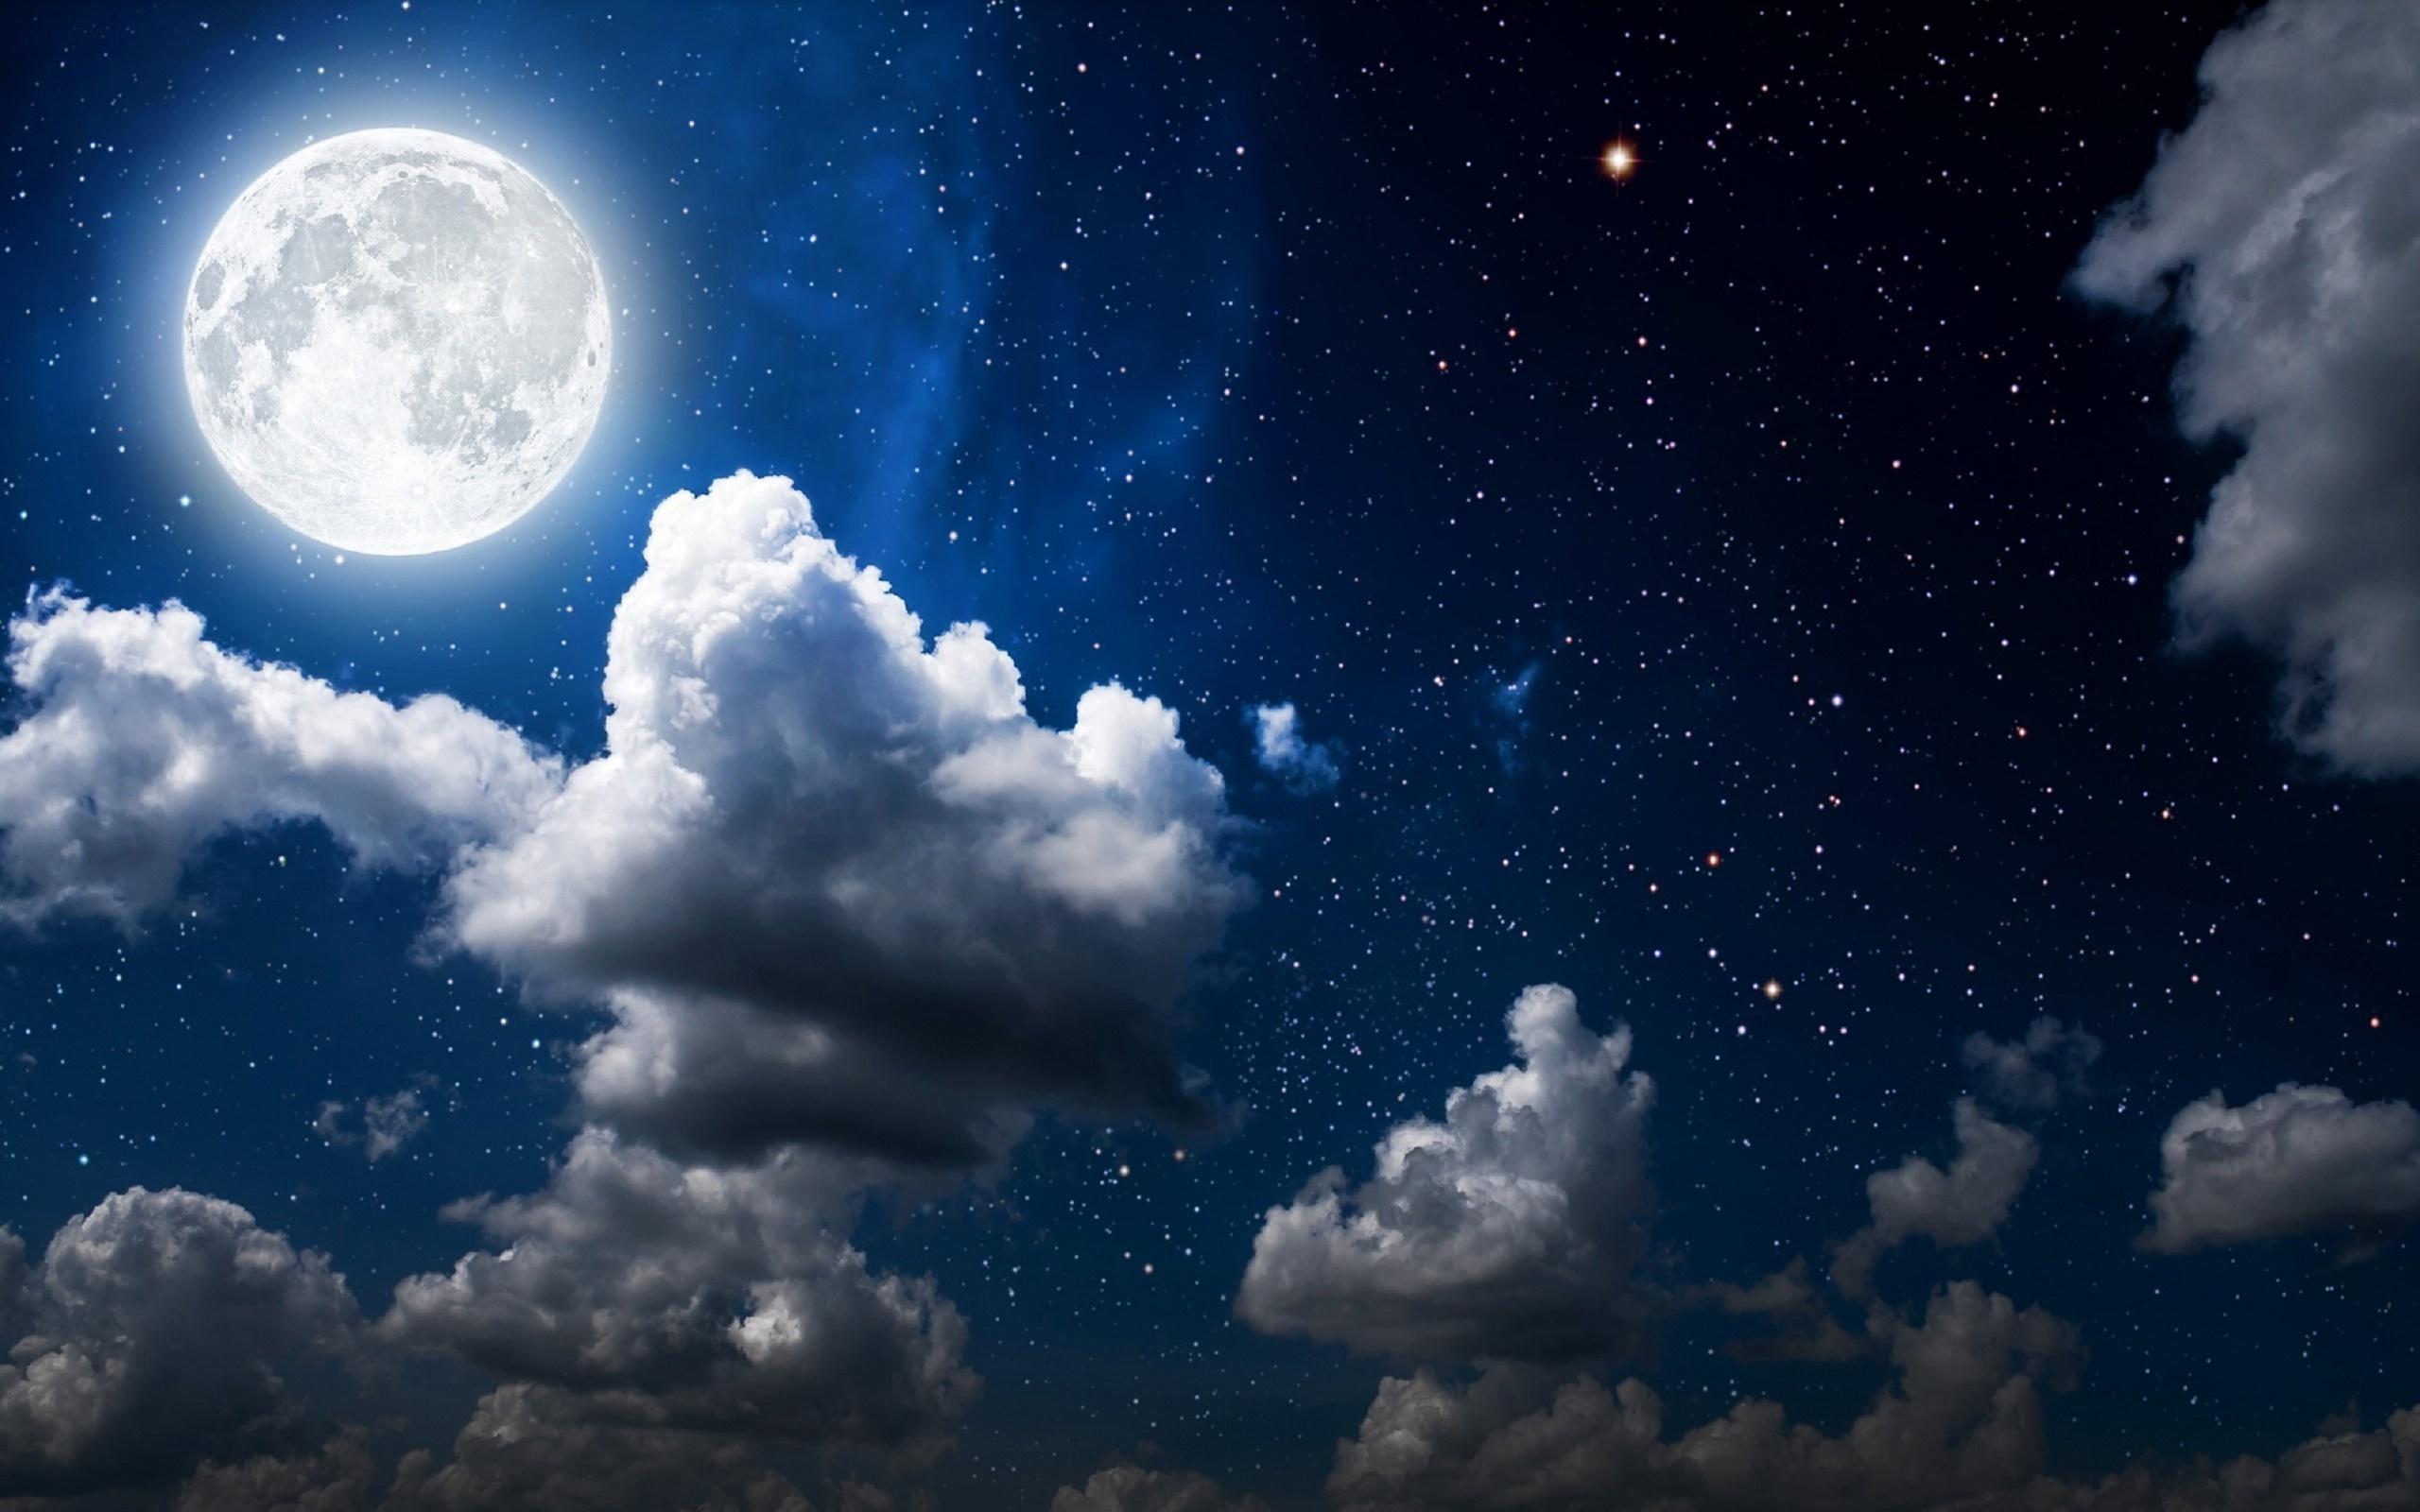 Moon Clouds Dark Sky Wallpapers In Jpg Format For Free Download